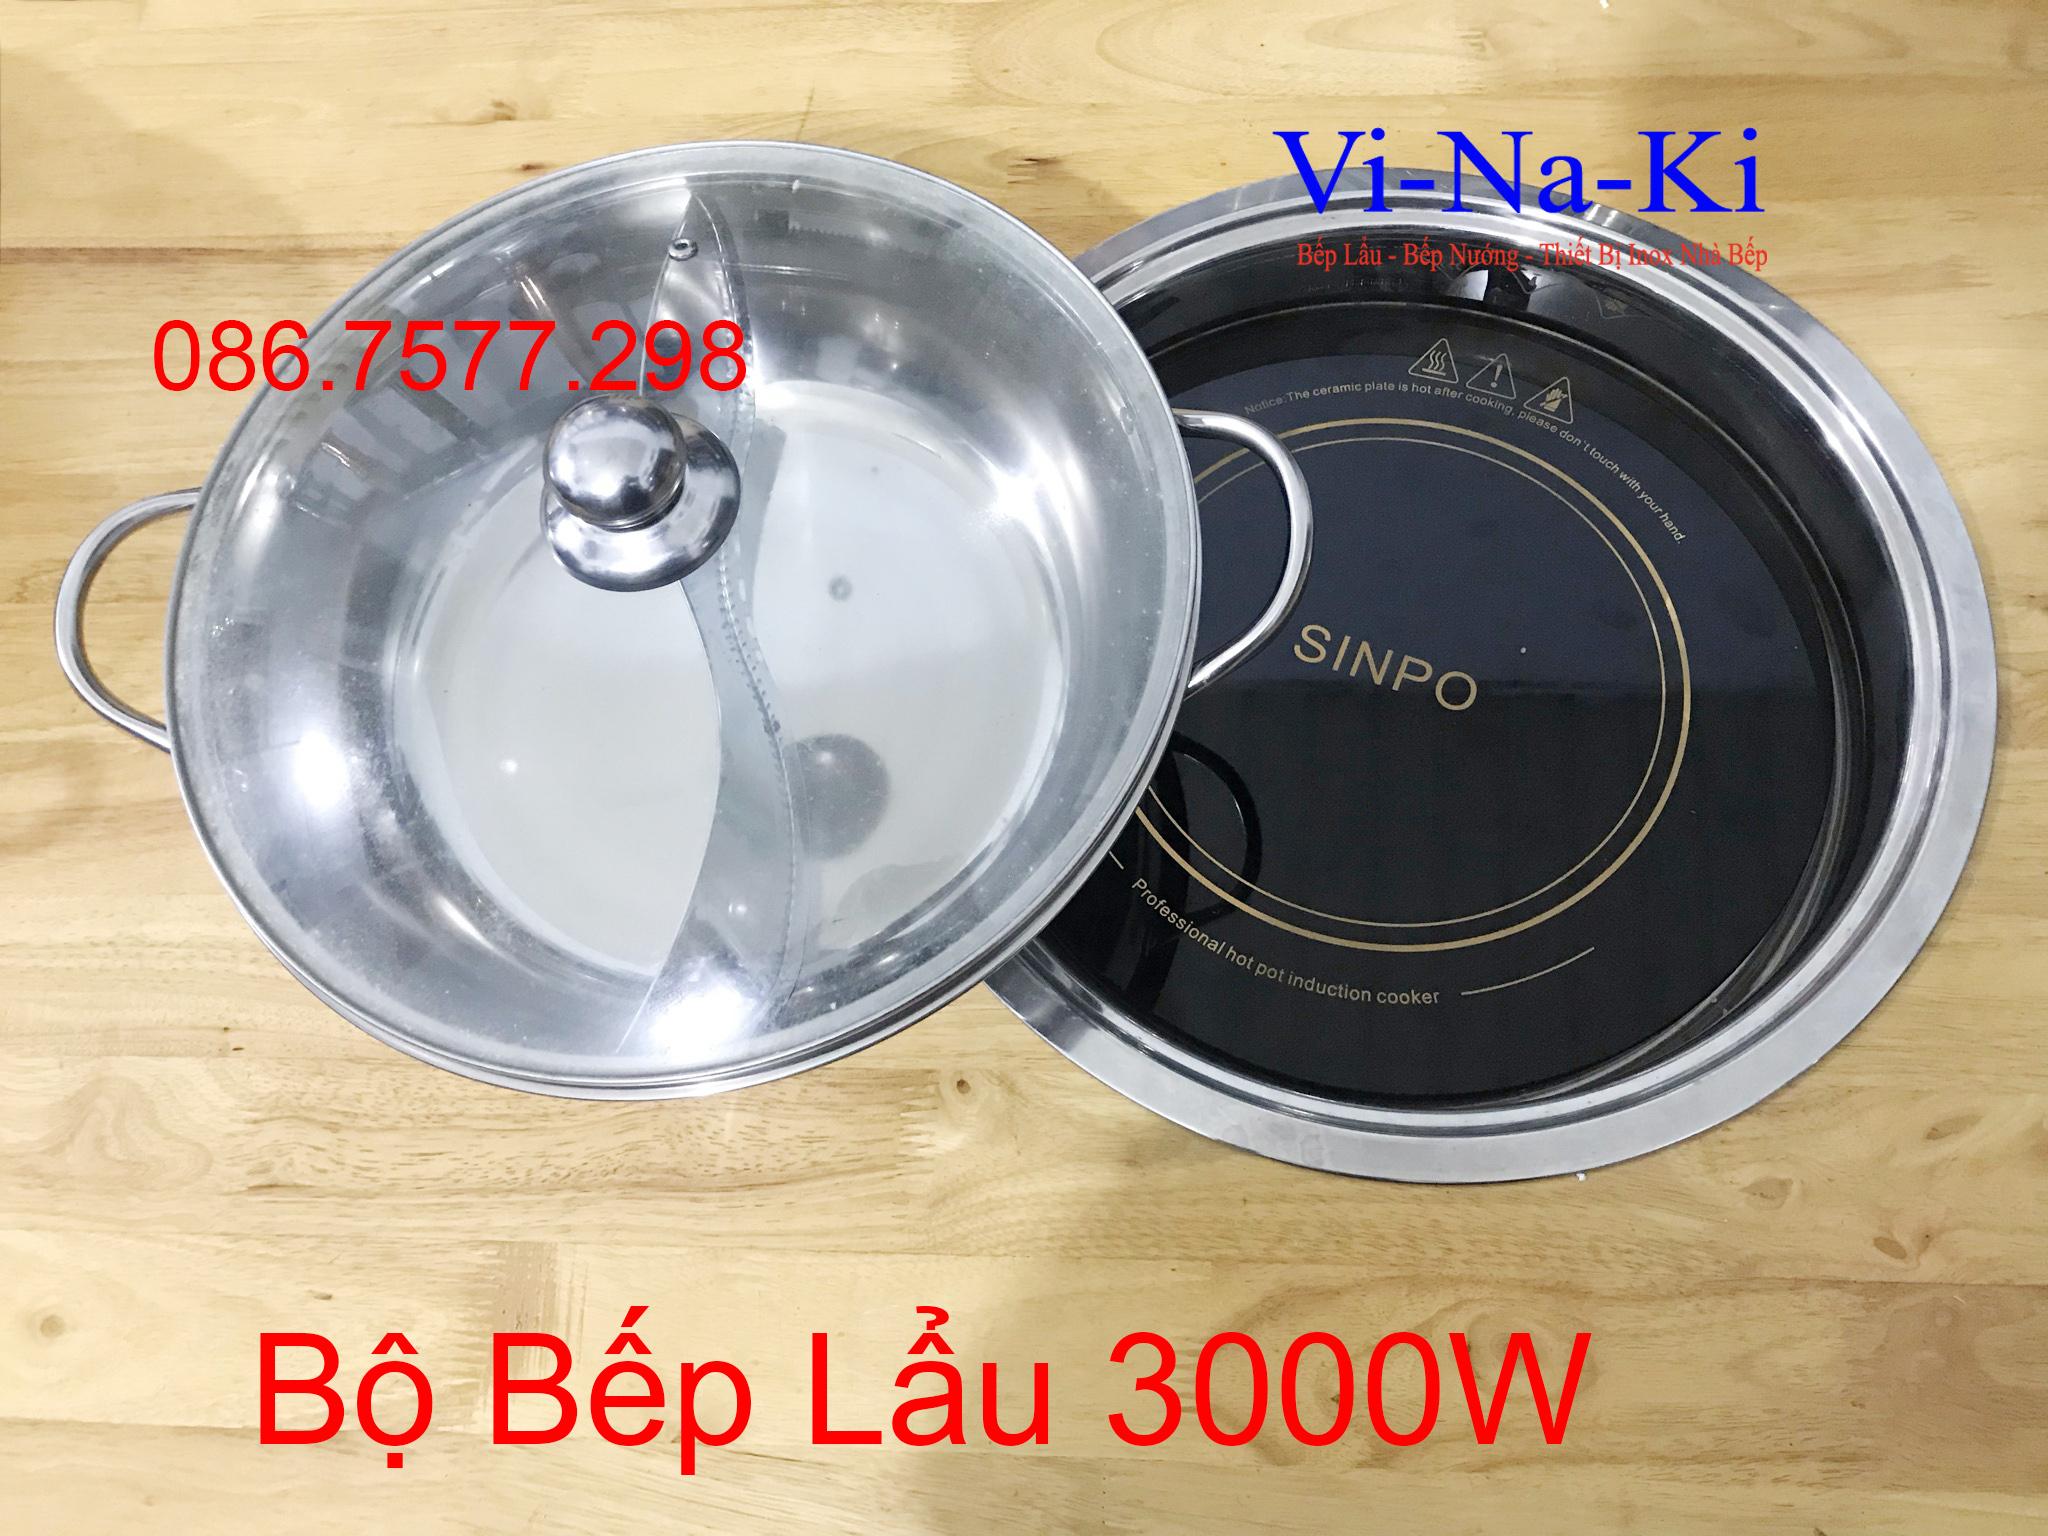 bộ bếp lẩu 3000w